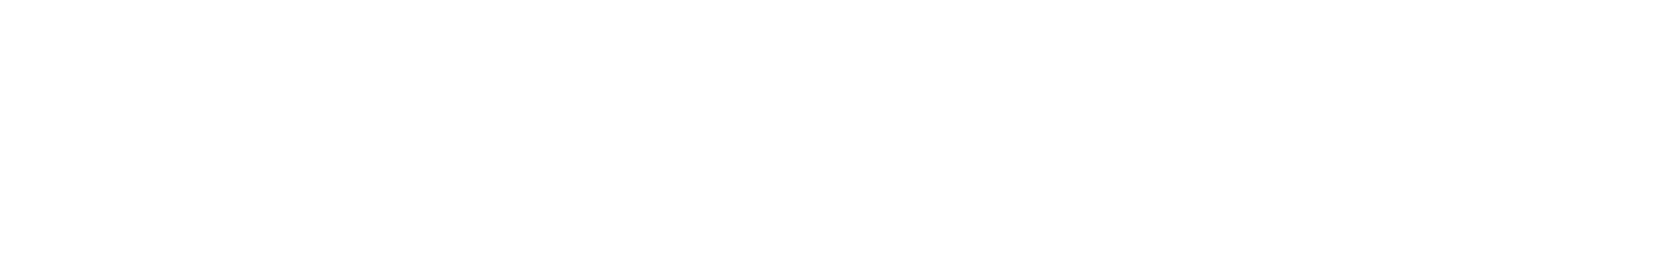 Logo Heraldo